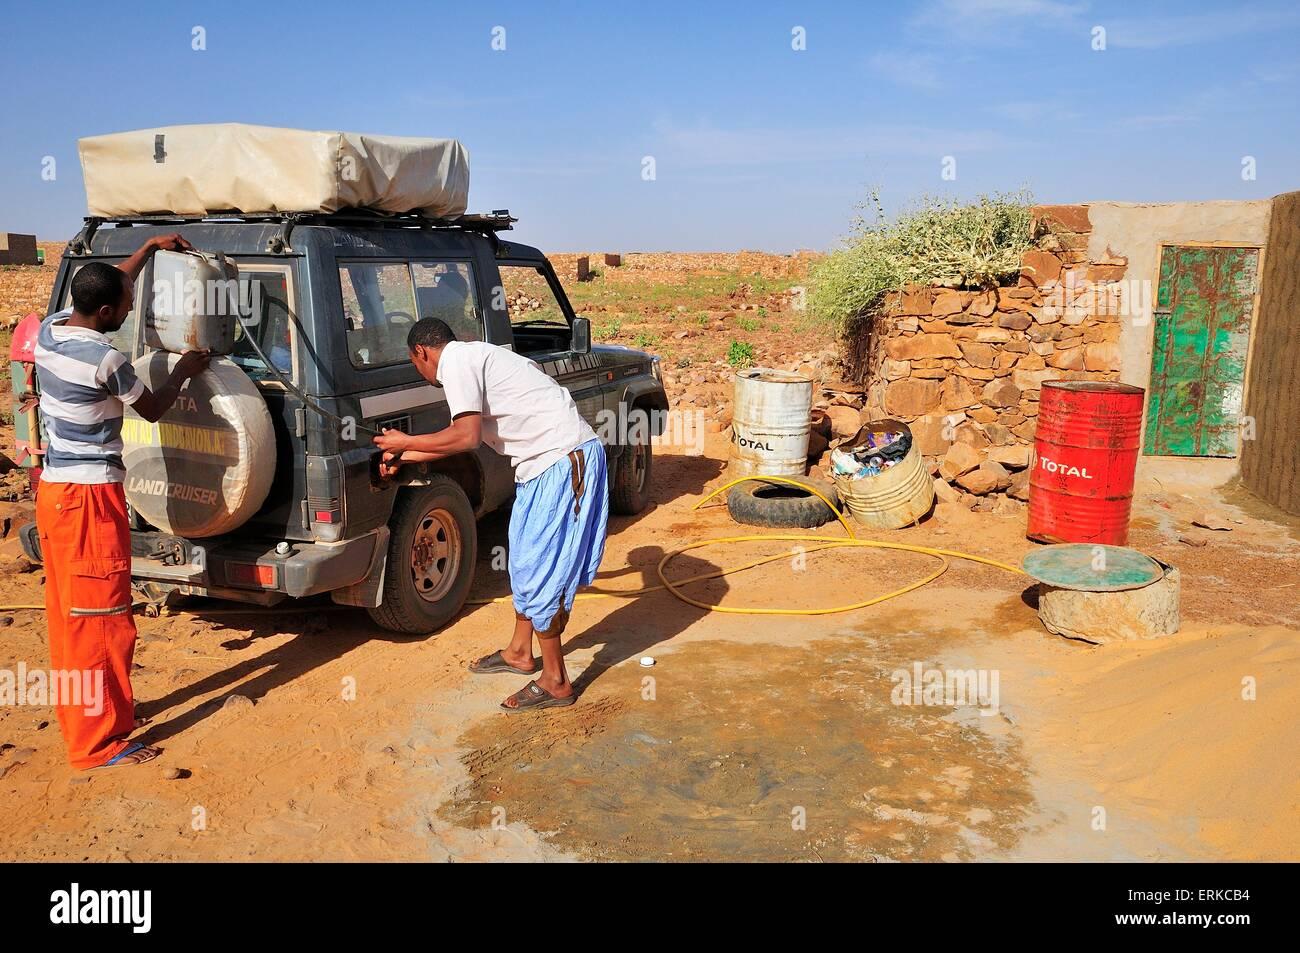 Gas station in a backyard of the new town, Ouadane, Adrar Region, Mauritania - Stock Image